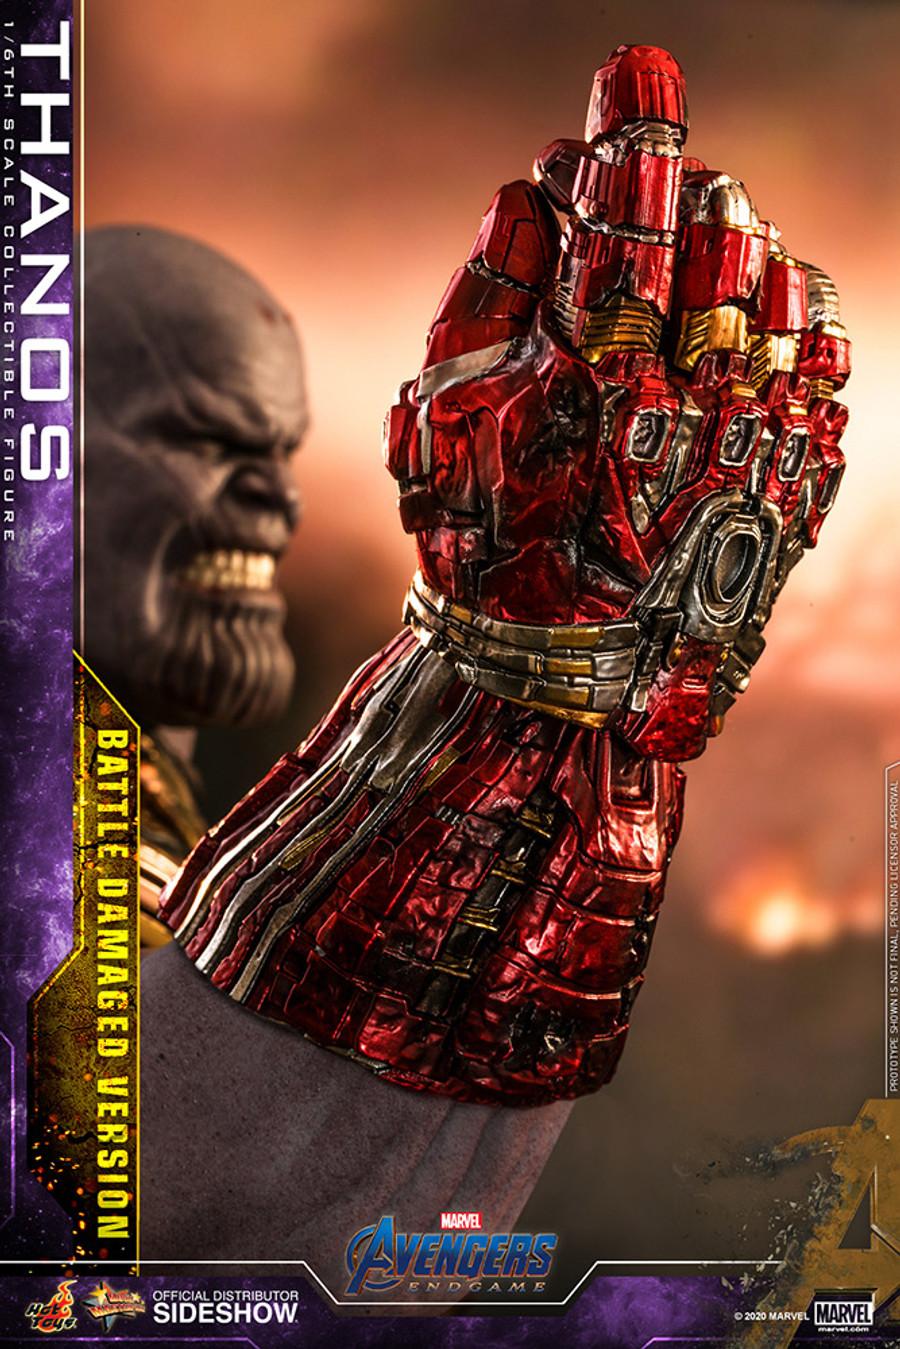 Hot Toys - Avengers Endgame - Thanos (Battle Damaged Version)